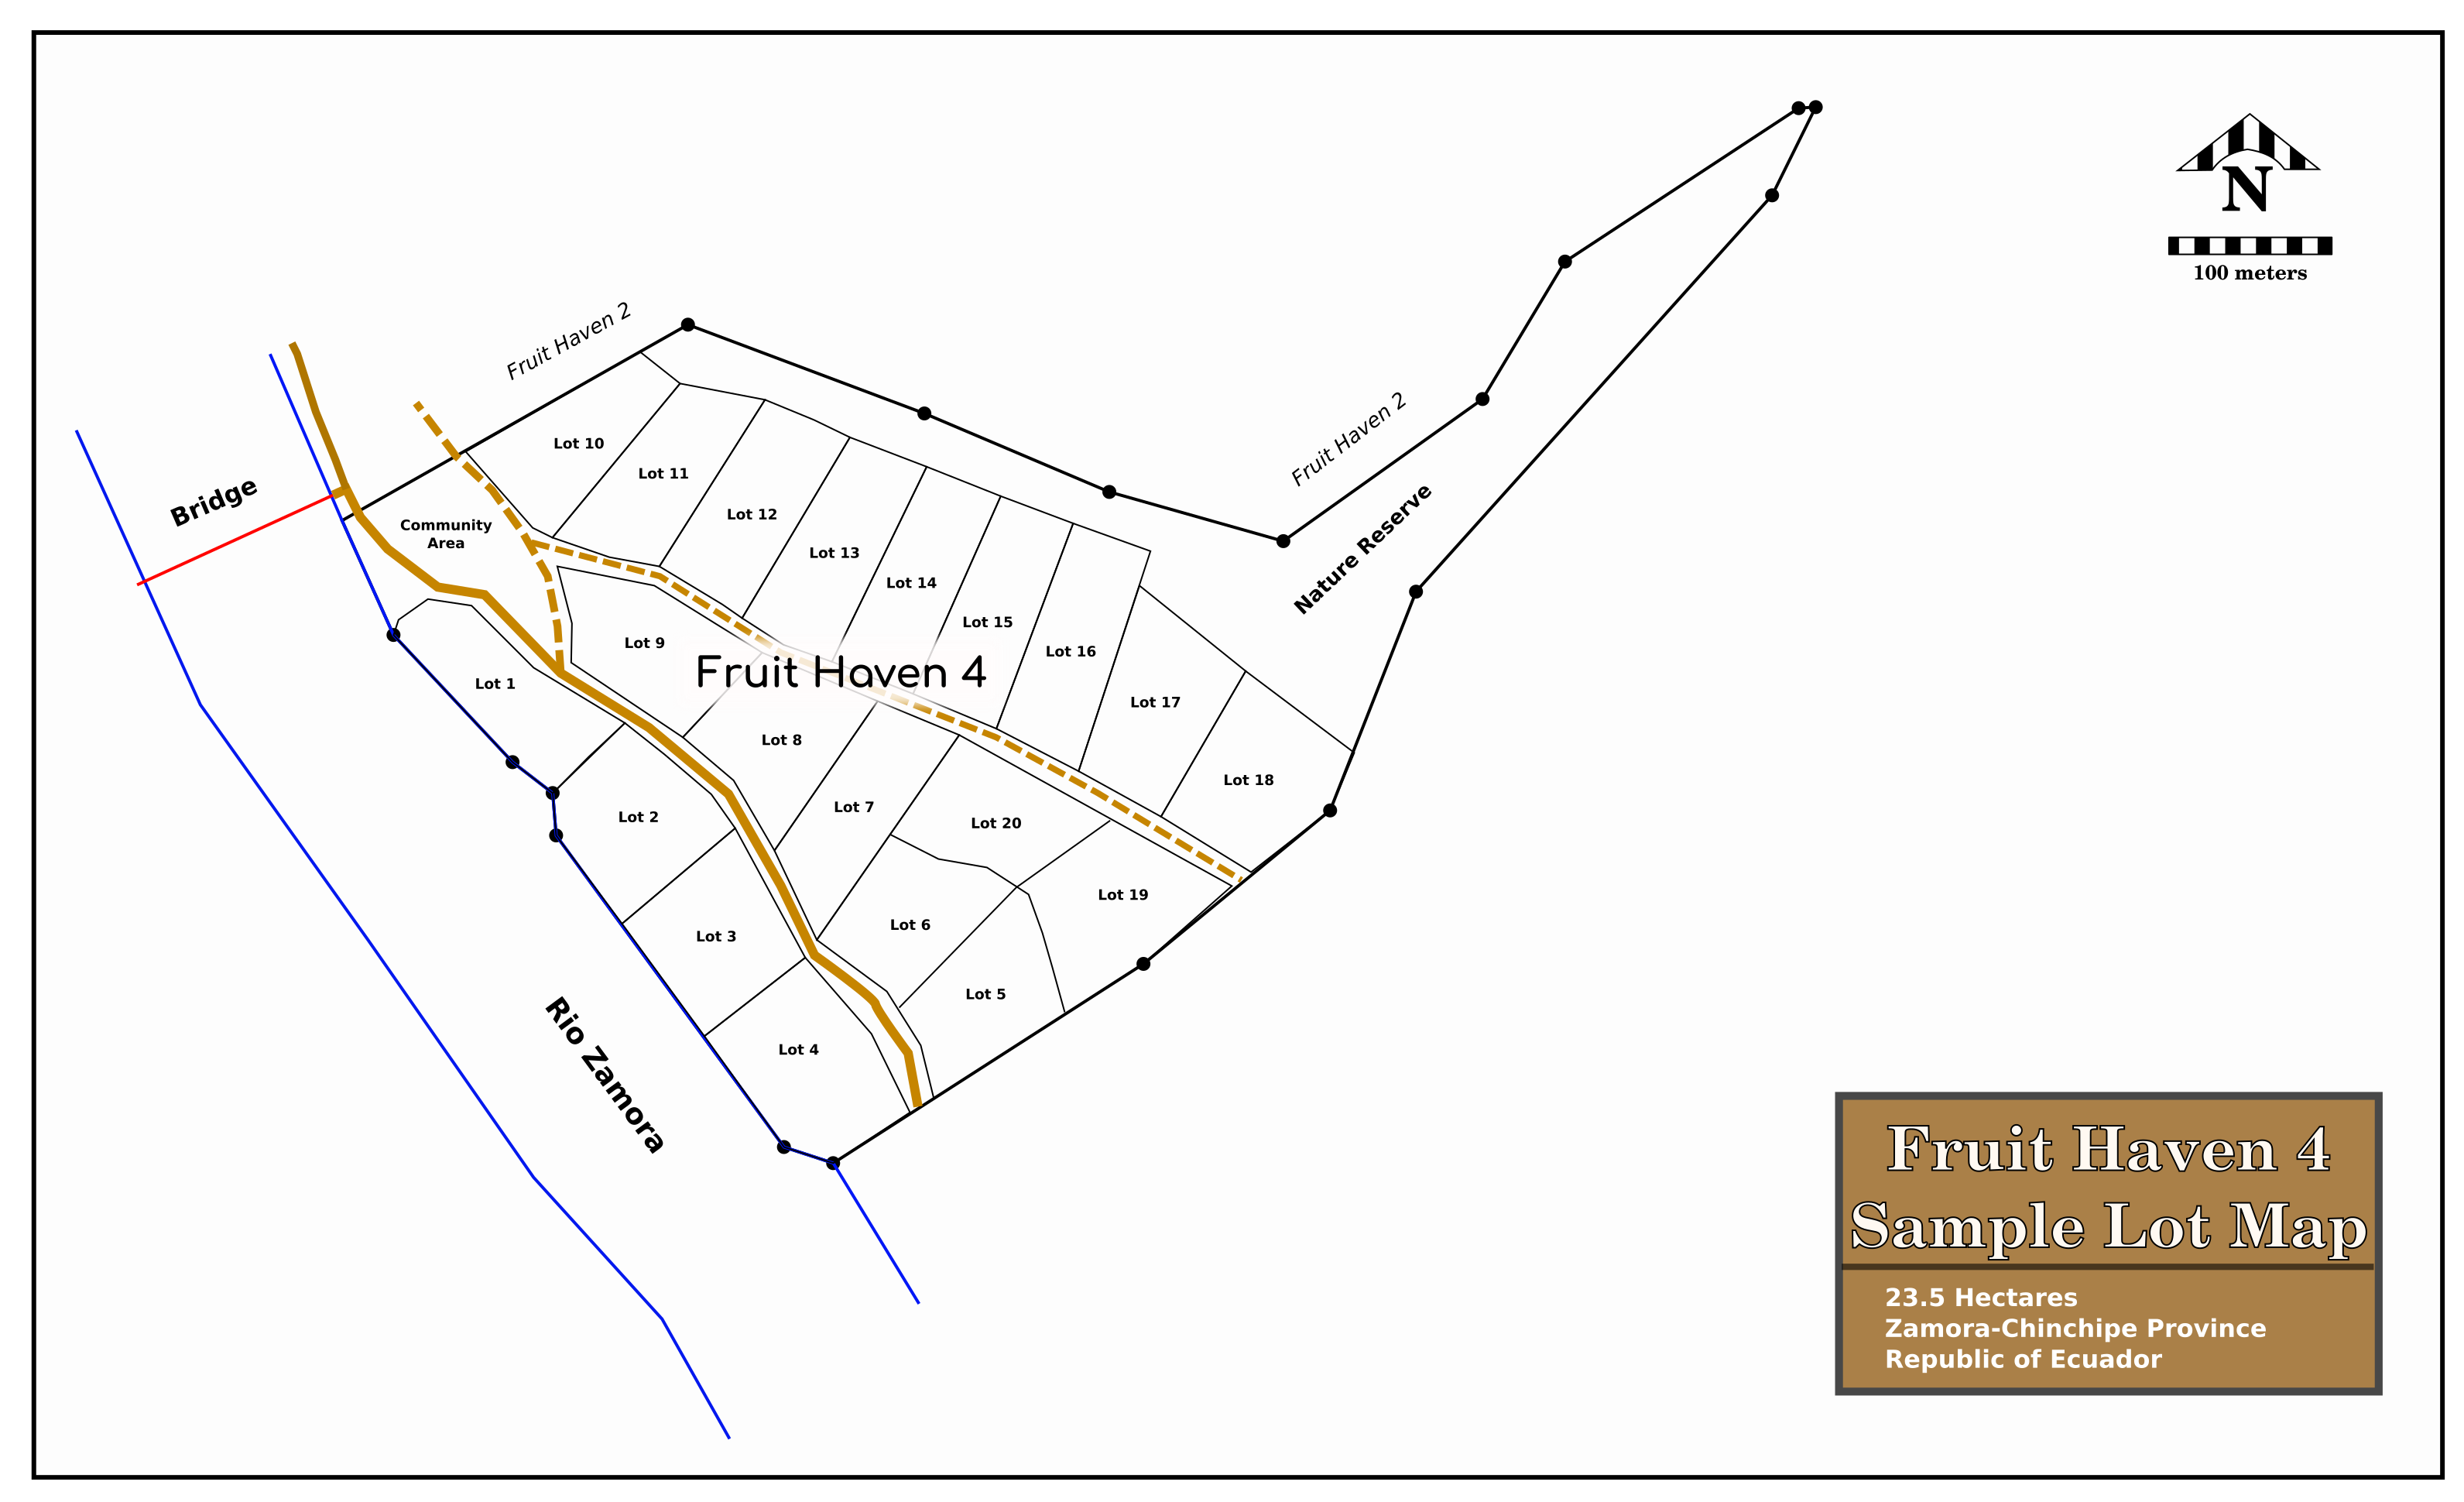 FH4 Sample Lot Map